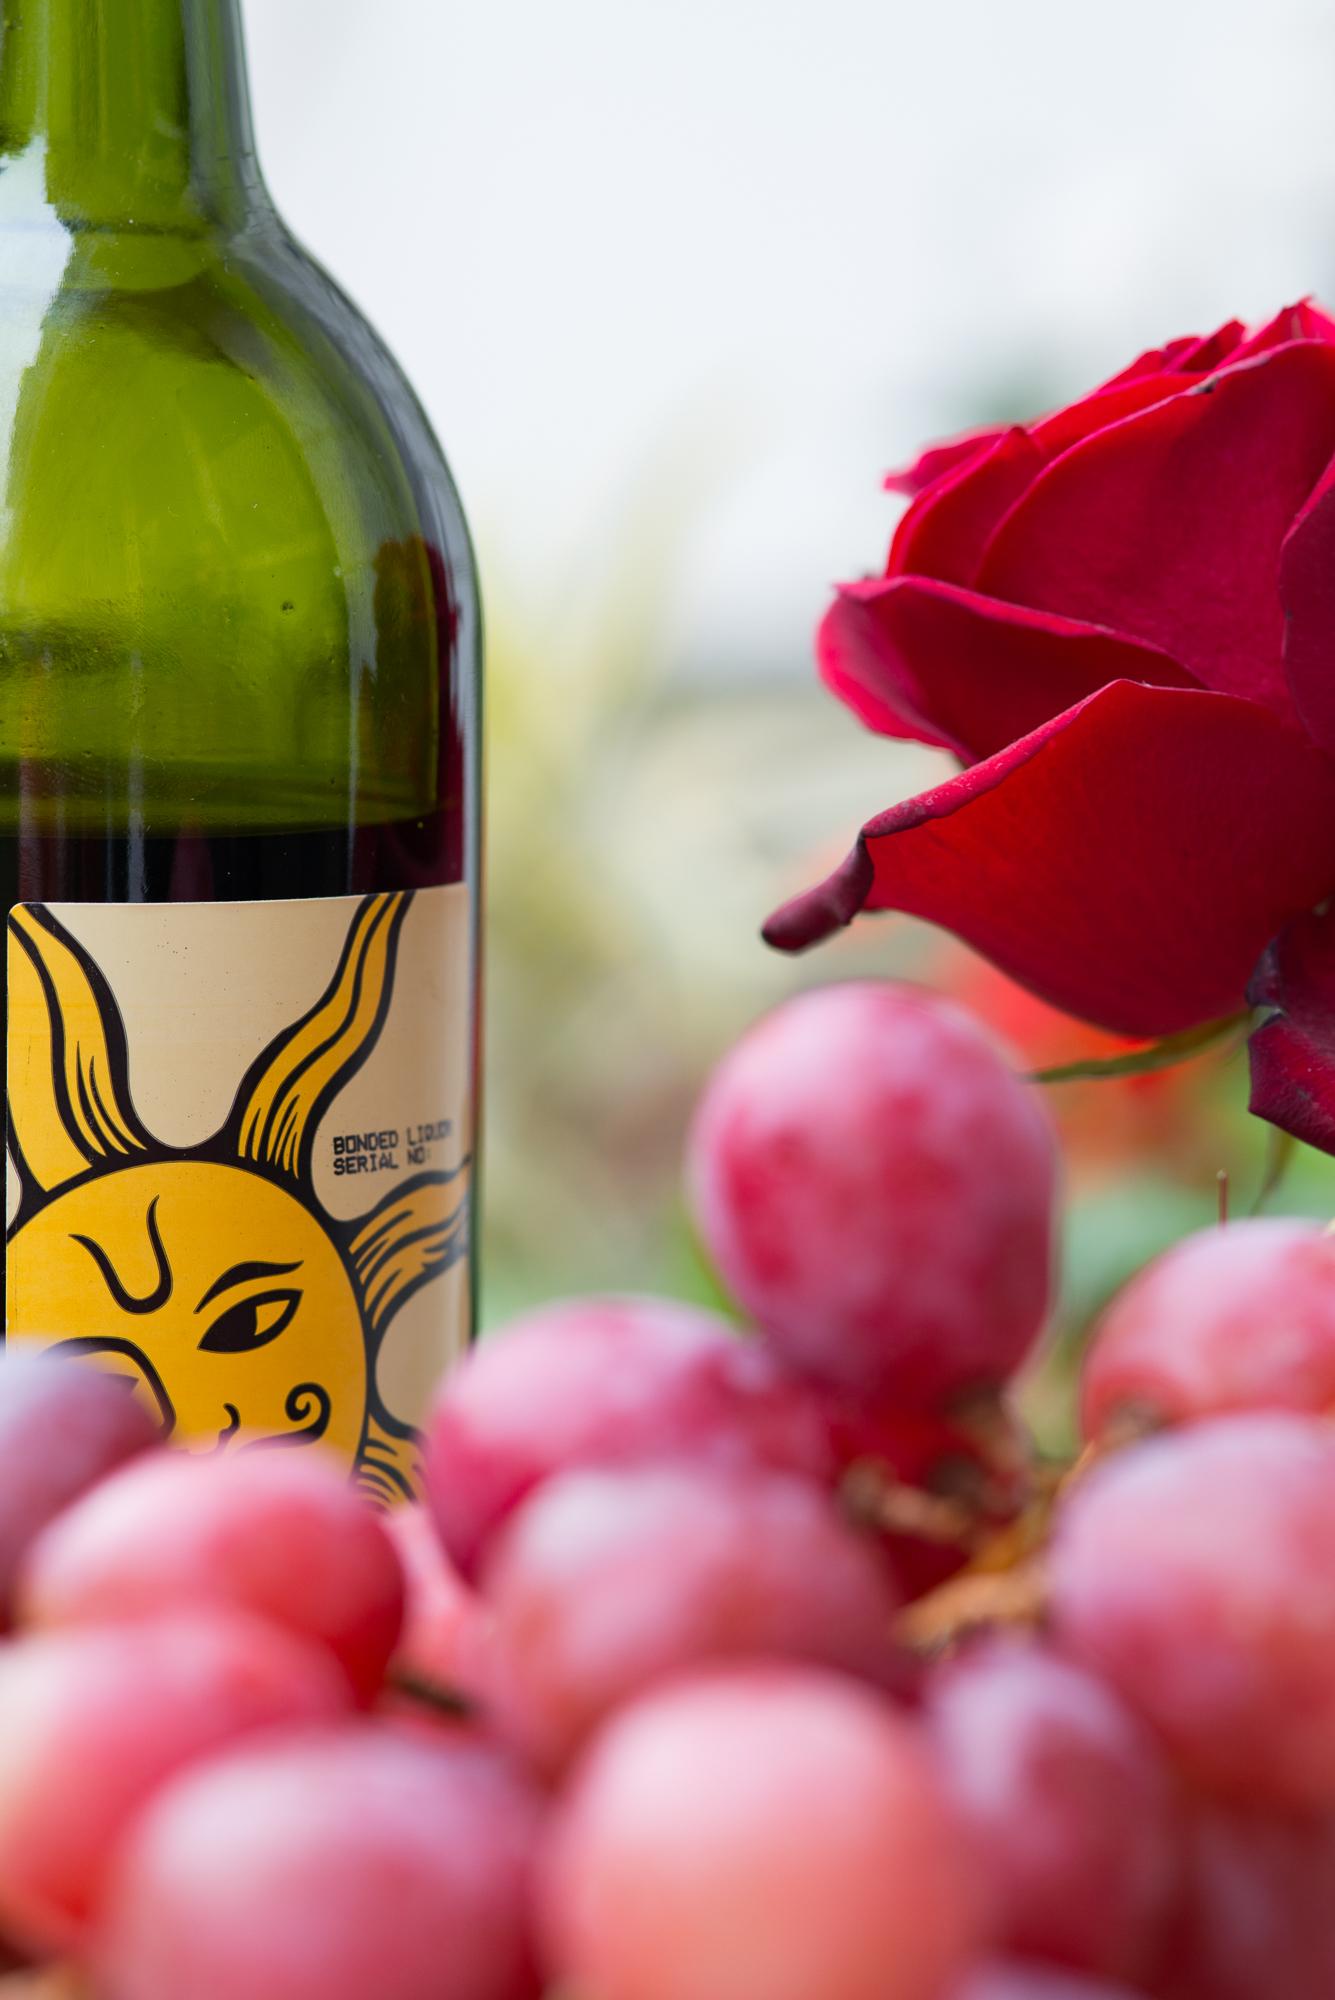 An arrangement of grapes, a wine bottle and a flower.